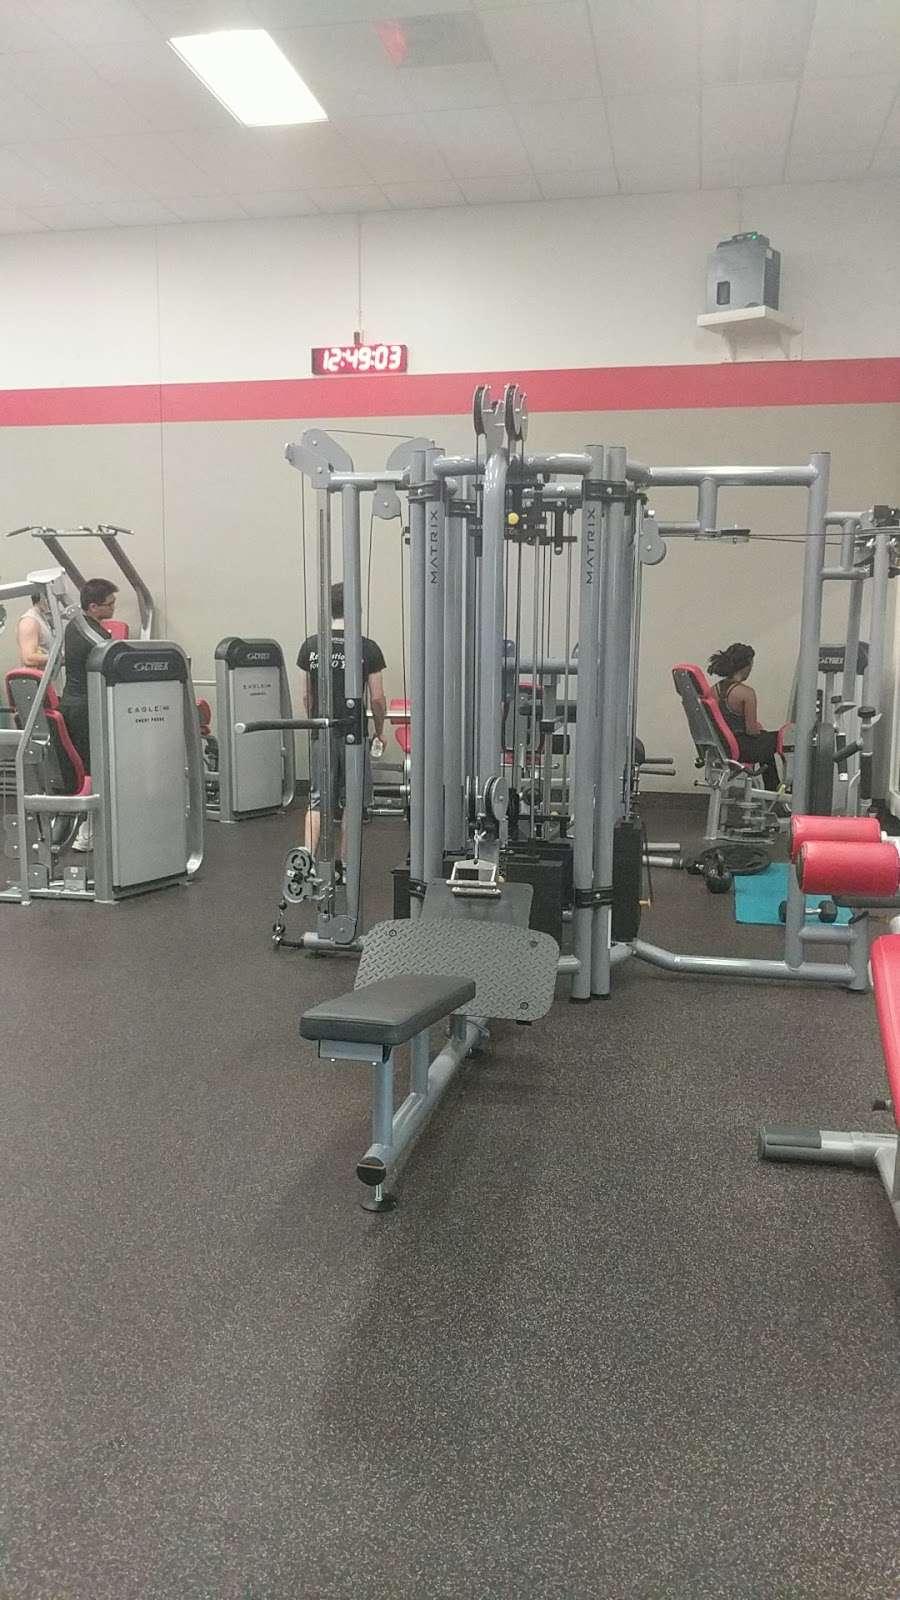 Cook/Douglass Recreation Center - gym  | Photo 6 of 10 | Address: 50 Biel Rd, New Brunswick, NJ 08901, USA | Phone: (848) 932-8700